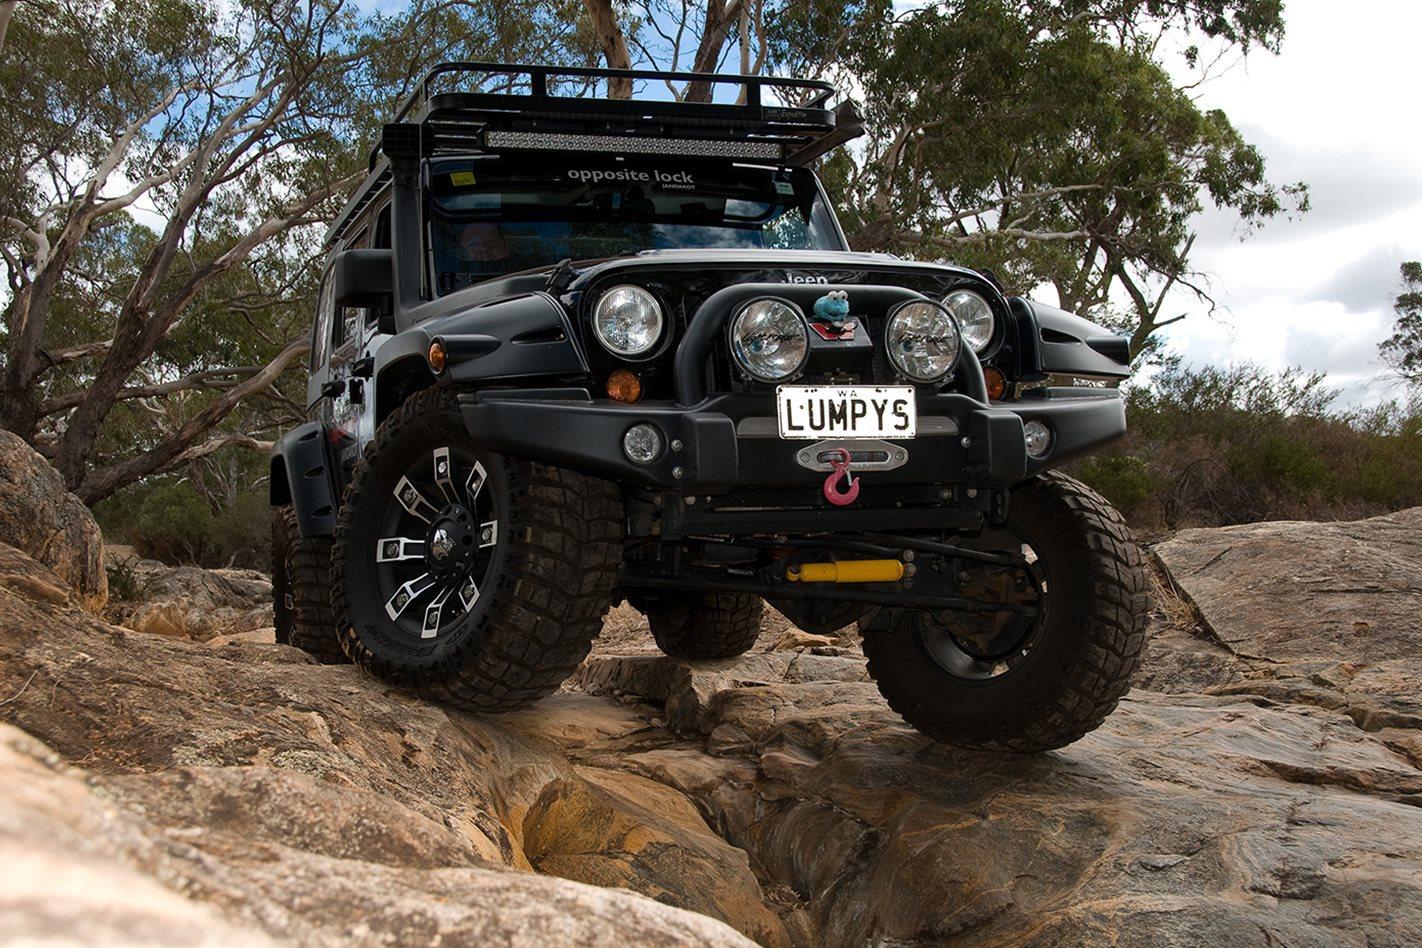 Jeep-Wrangler-Rubicon-front.jpg